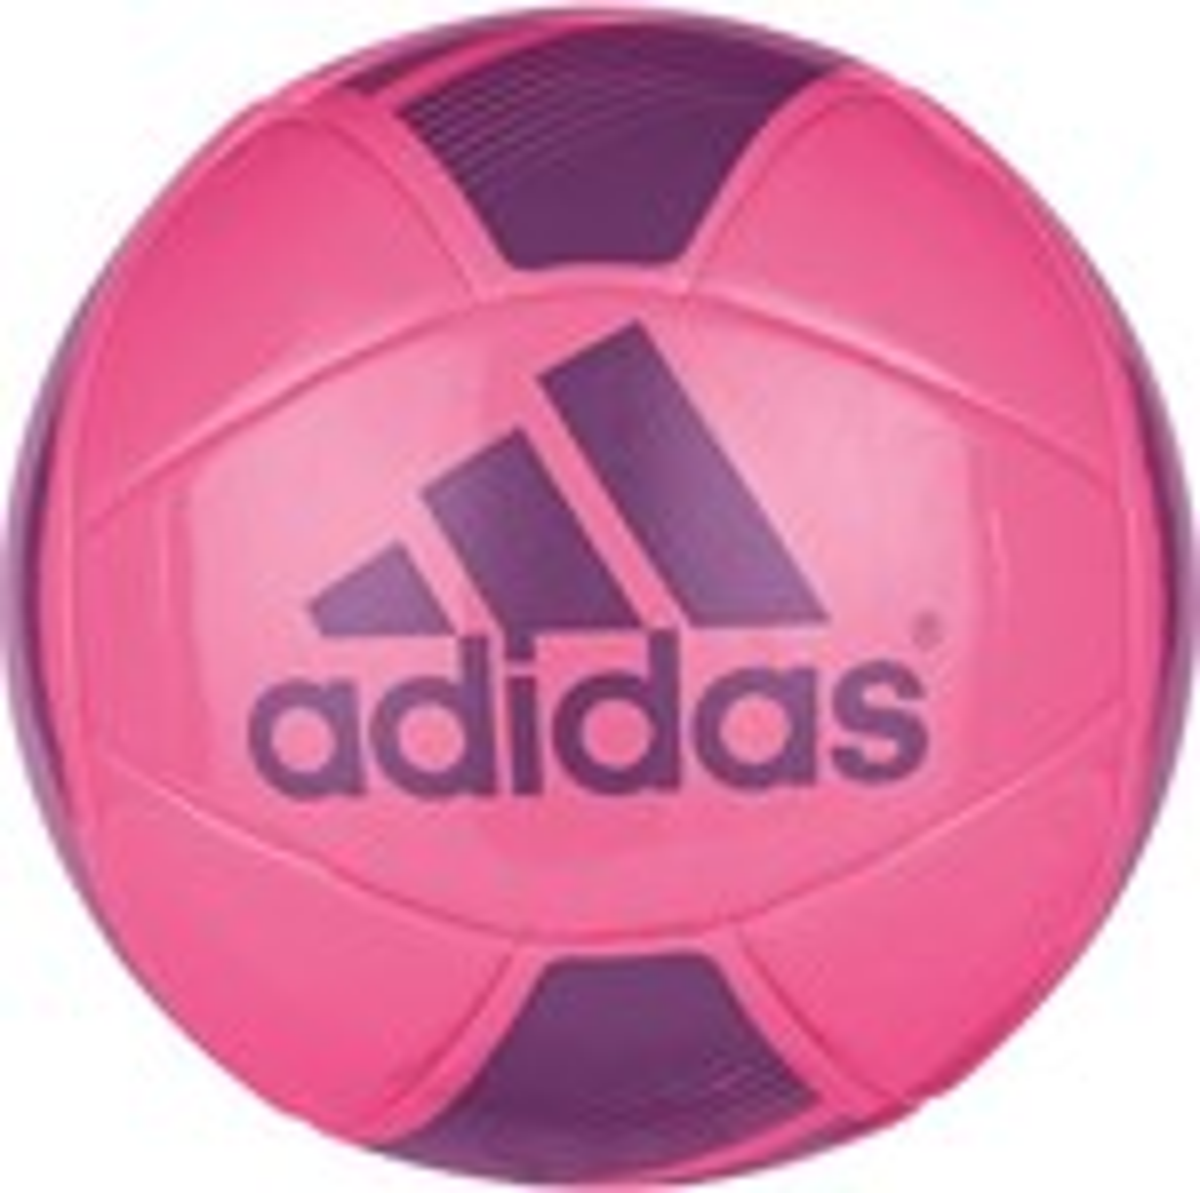 adidas™ EPP Glider Soccer Ball